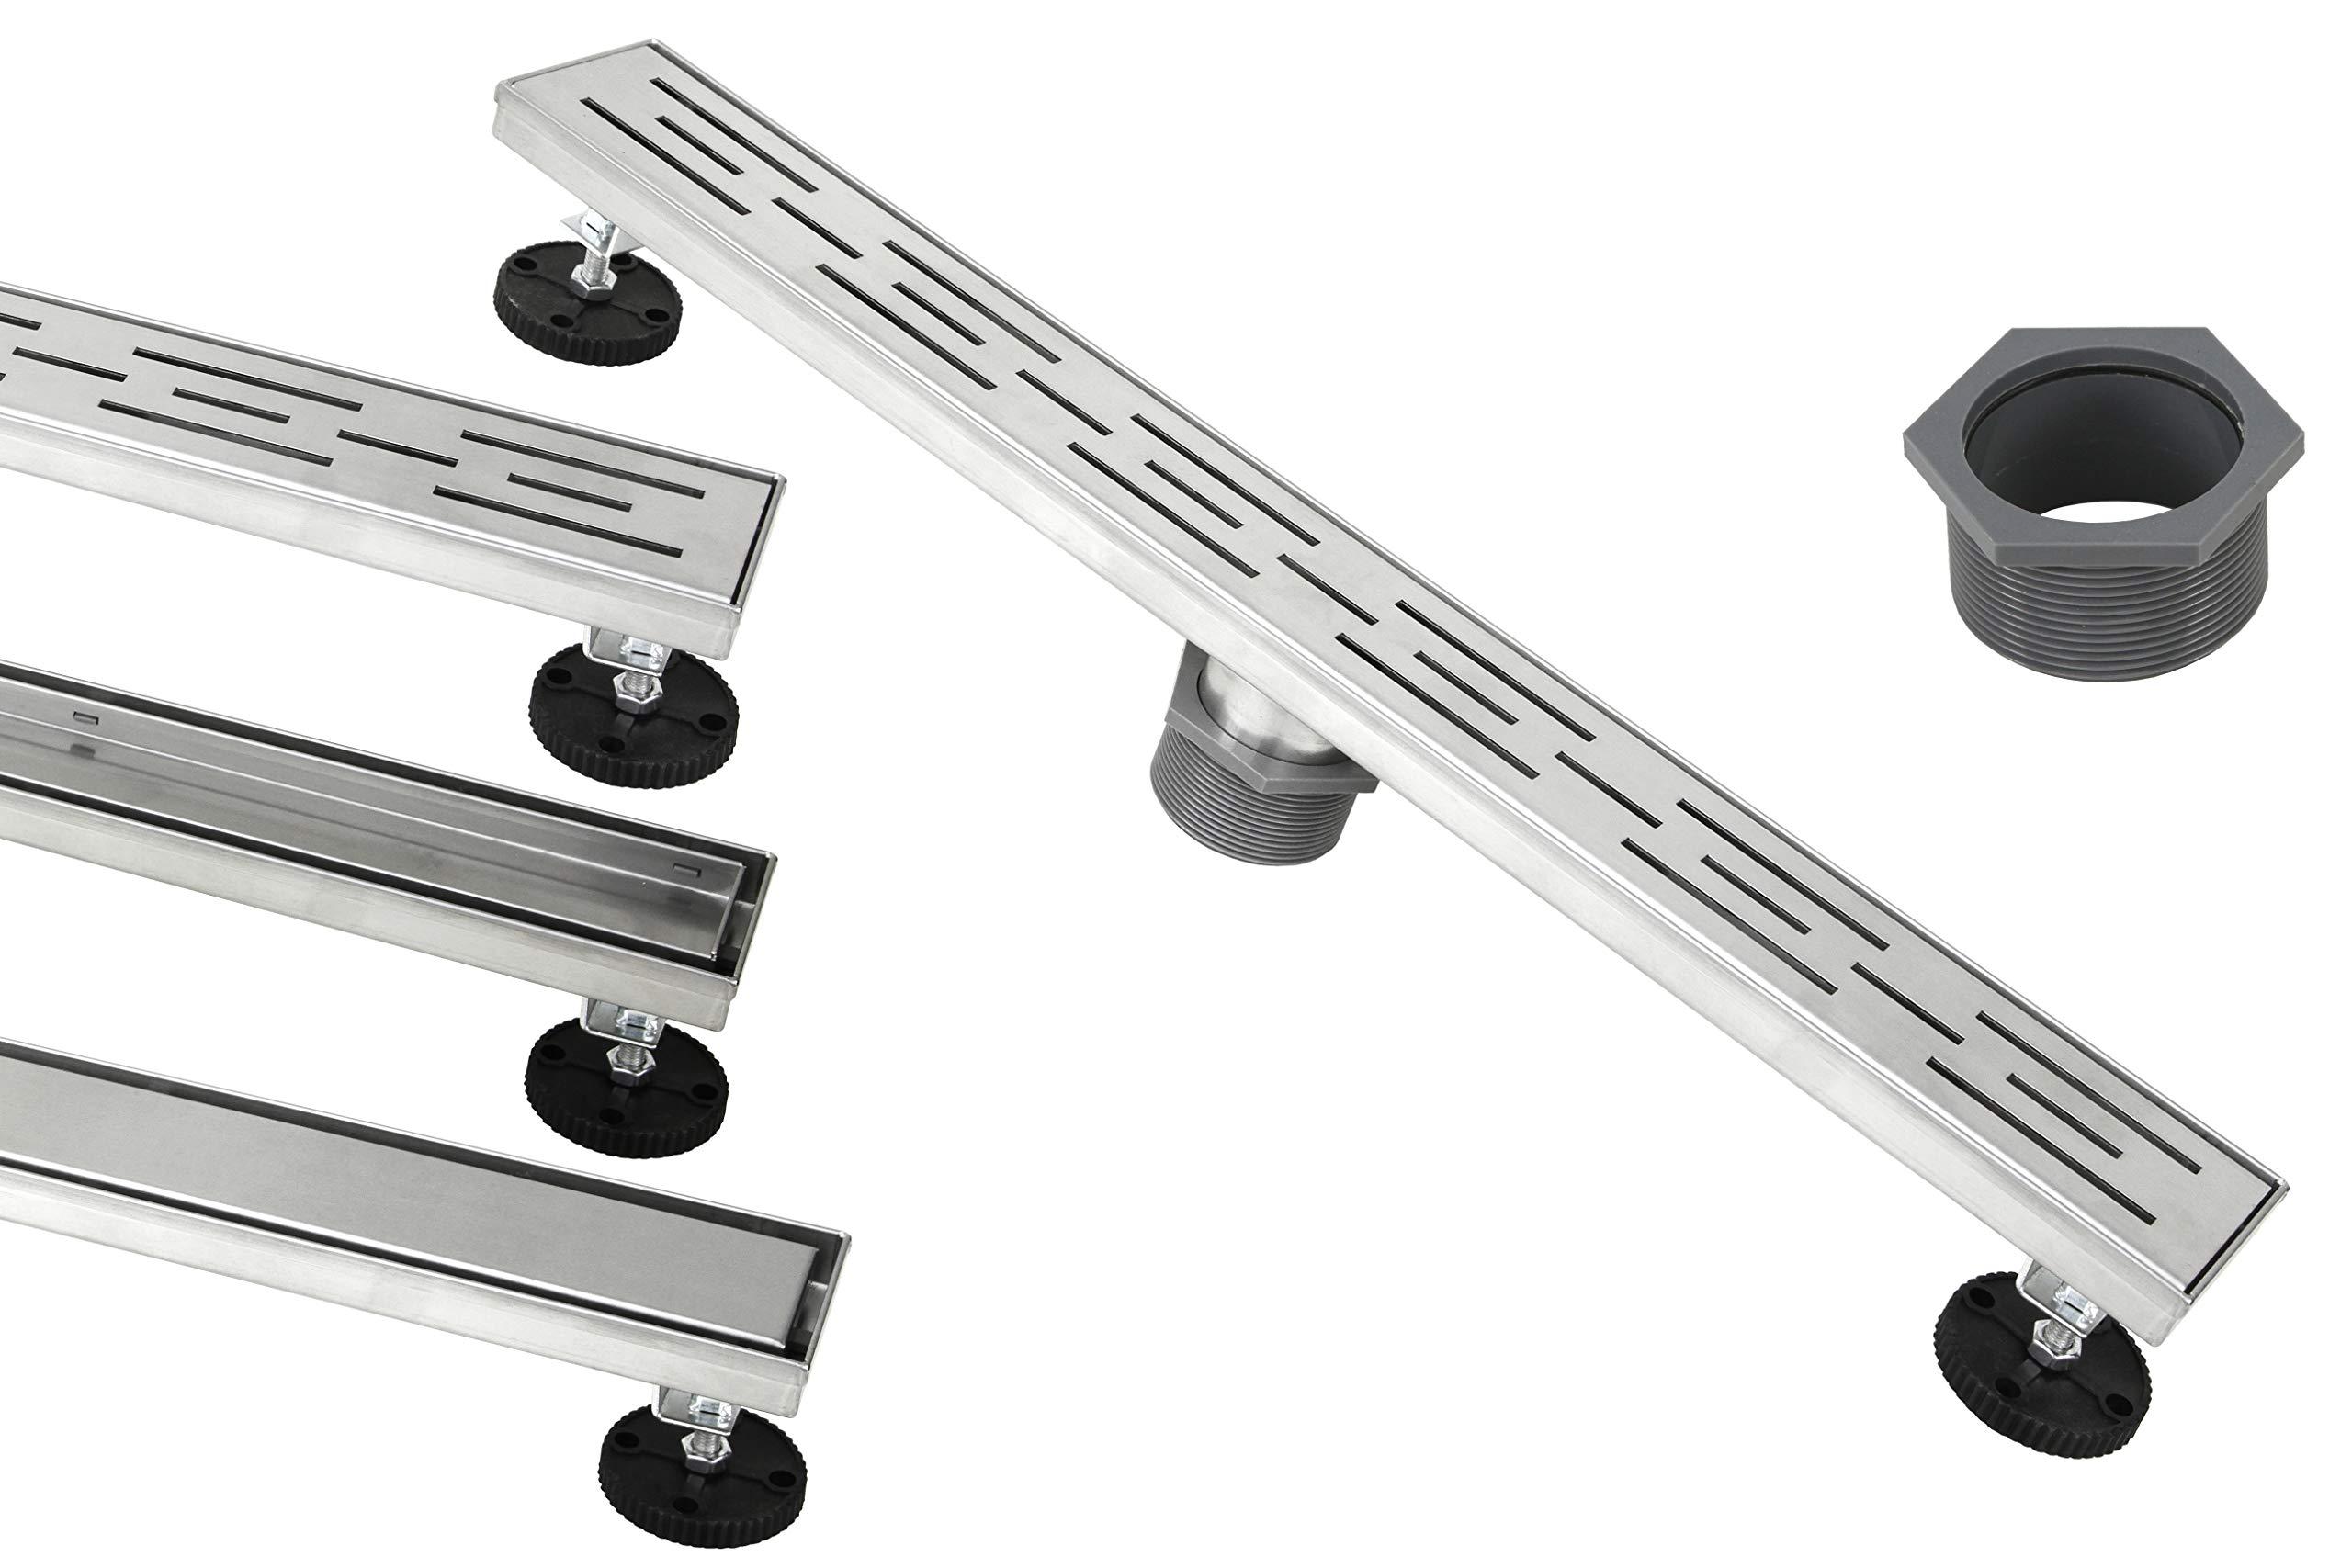 eModernDecor Shower Linear Drain 48 Inch – Stripe Pattern Grate – Brushed 304 Stainless Steel – Bonus 2-Sided Tile Insert & Flat Grate and Threaded Adaptor – Adjustable Leveling Feet